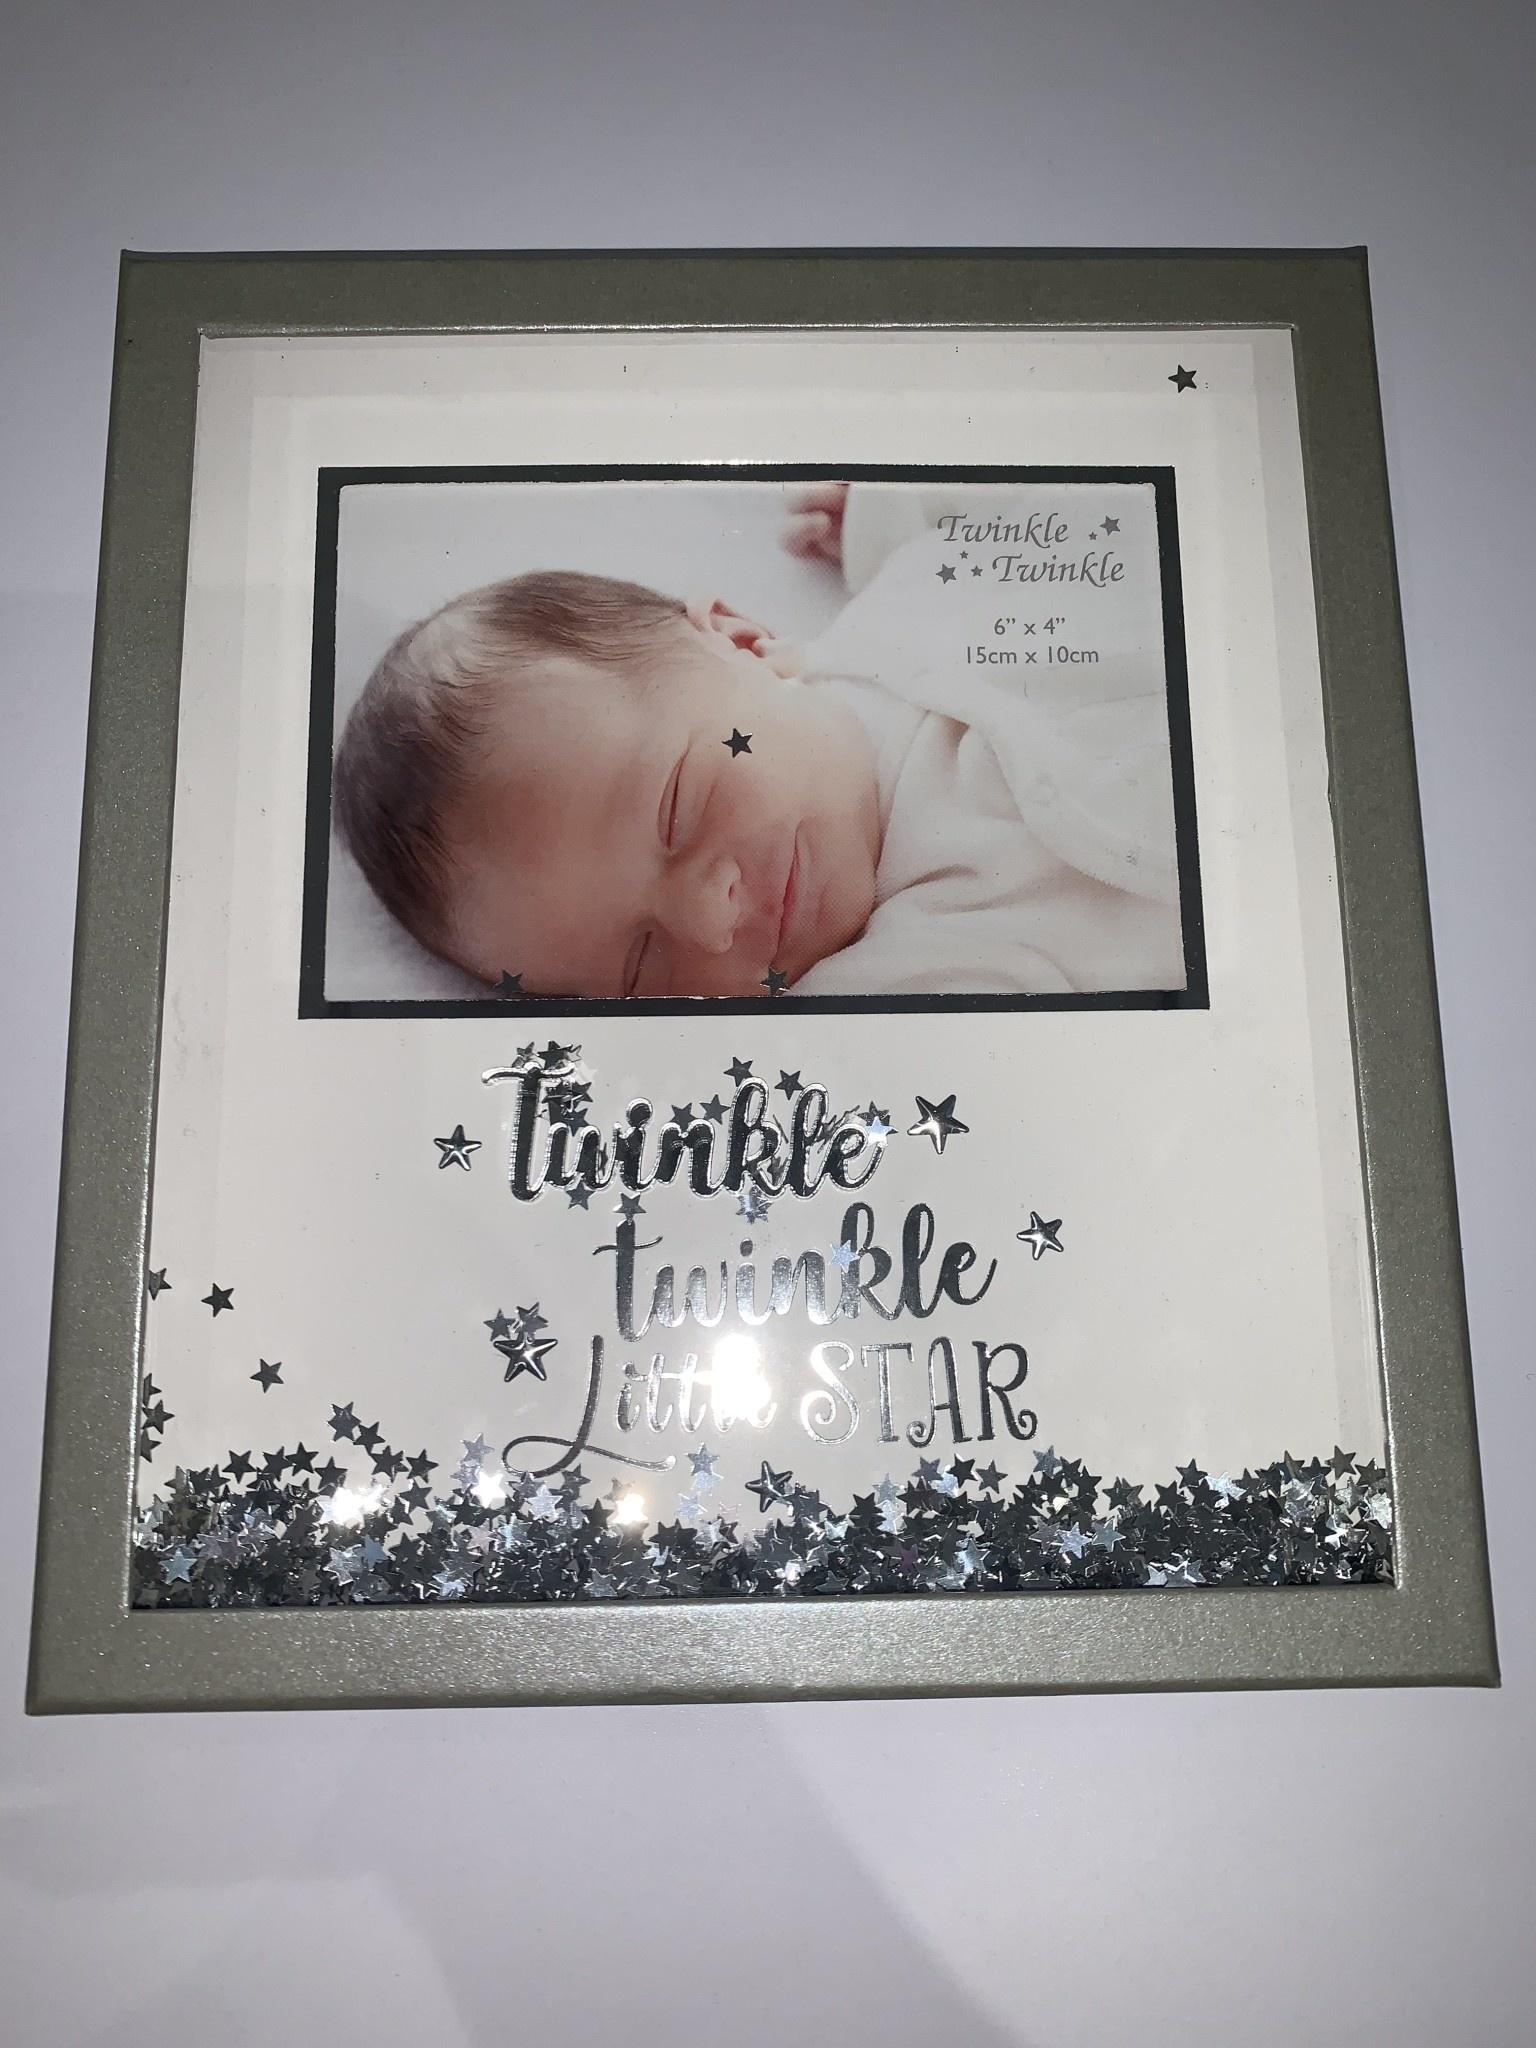 "Twinkle Twinkle Twinkle Twinkle Little Star Silver and White Frame Unisex 6 x 4 """